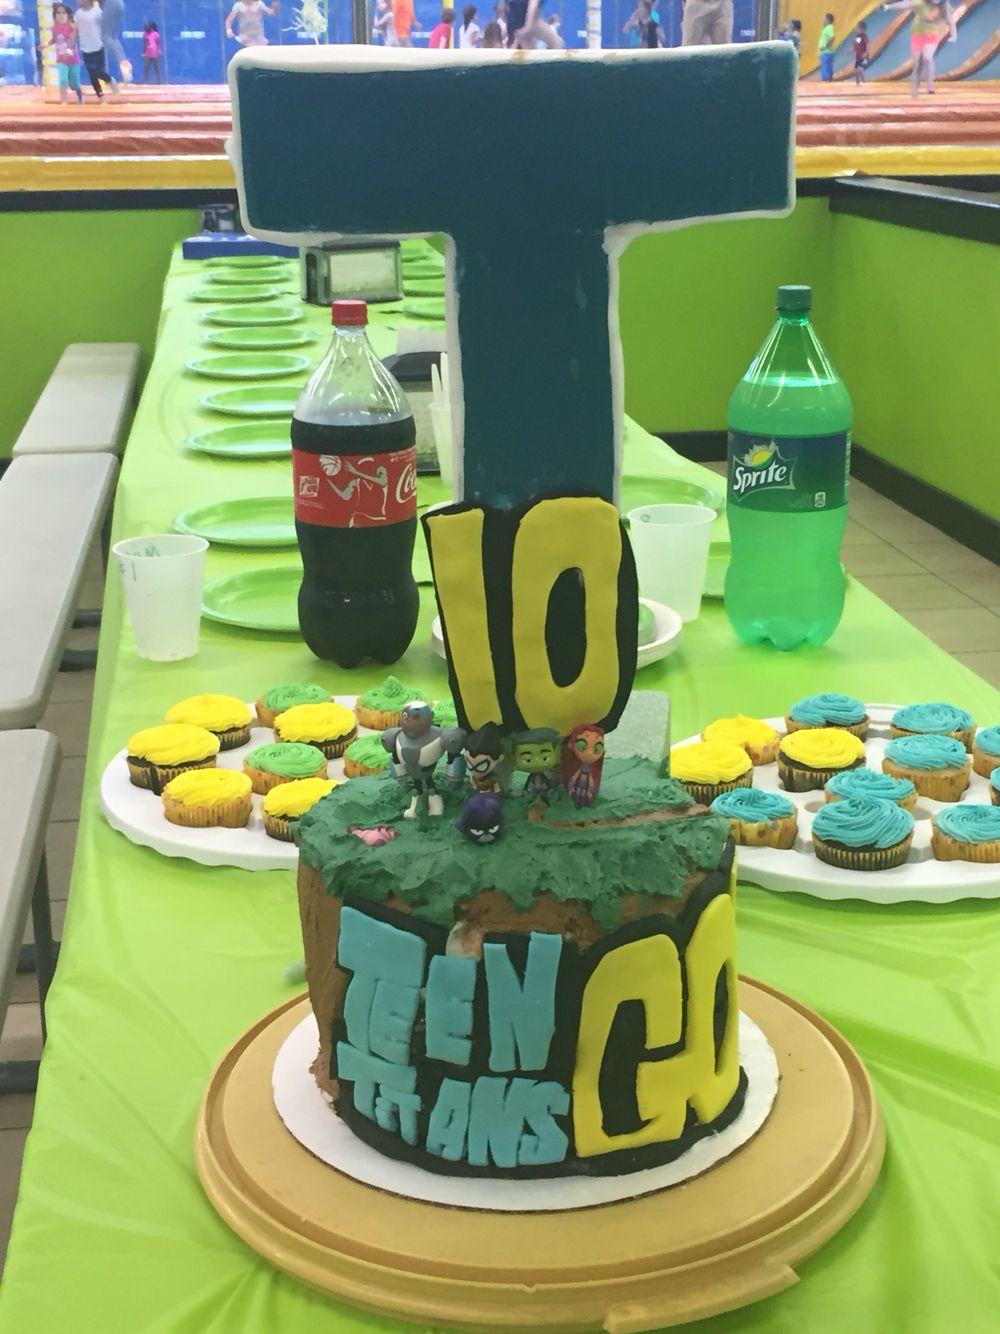 Teen Titans Go Tower Birthday Cake  Boys Birthday Party -5995